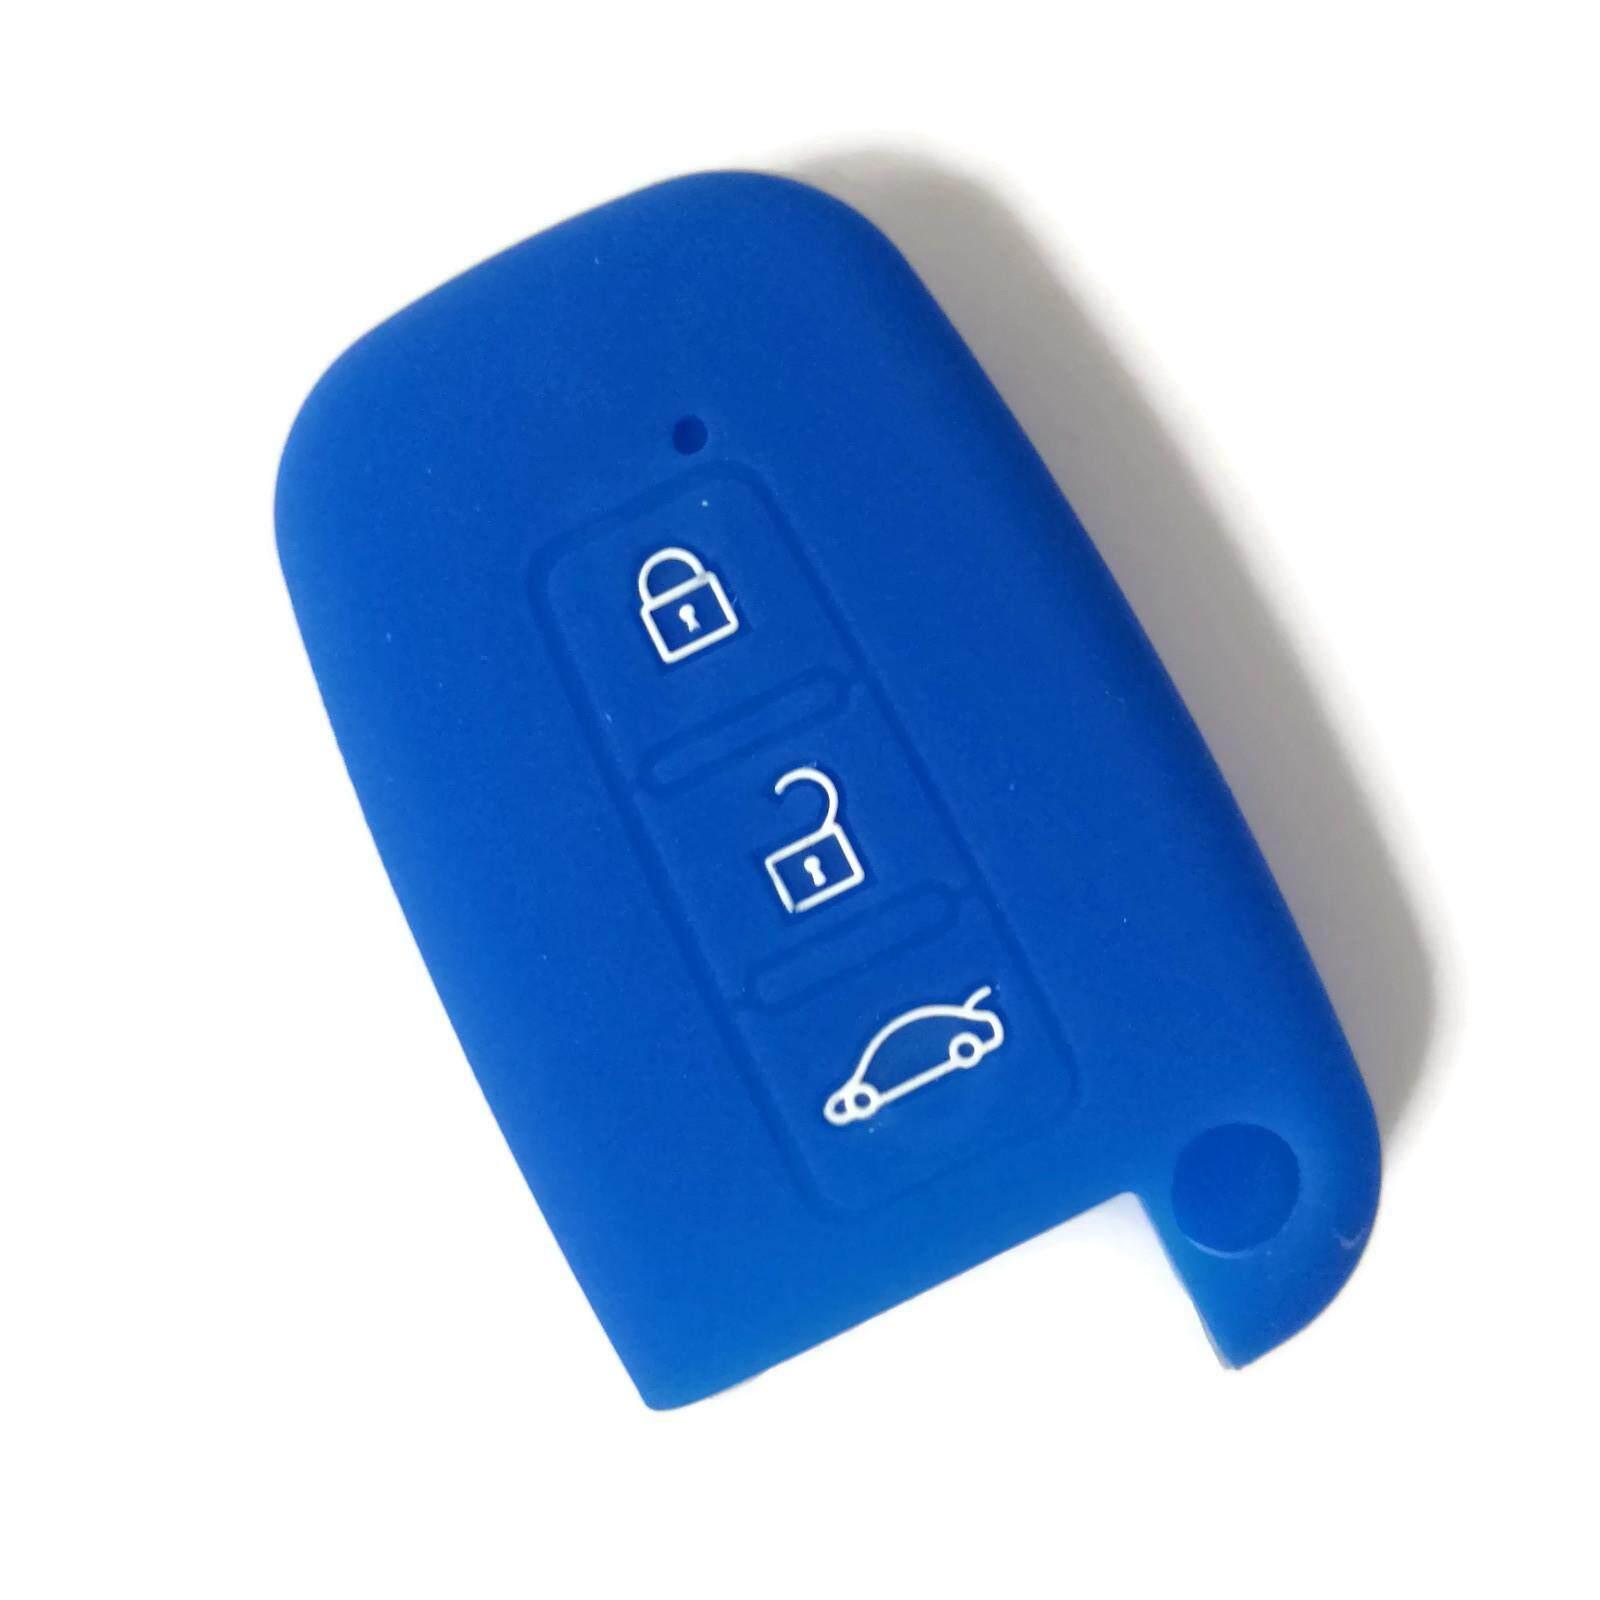 Kia Automotive Exterior Accessories Price In Malaysia Best 2013 Optima Wiring Diagram Sportage Keyless Remote Silicone Car Key Cover Case